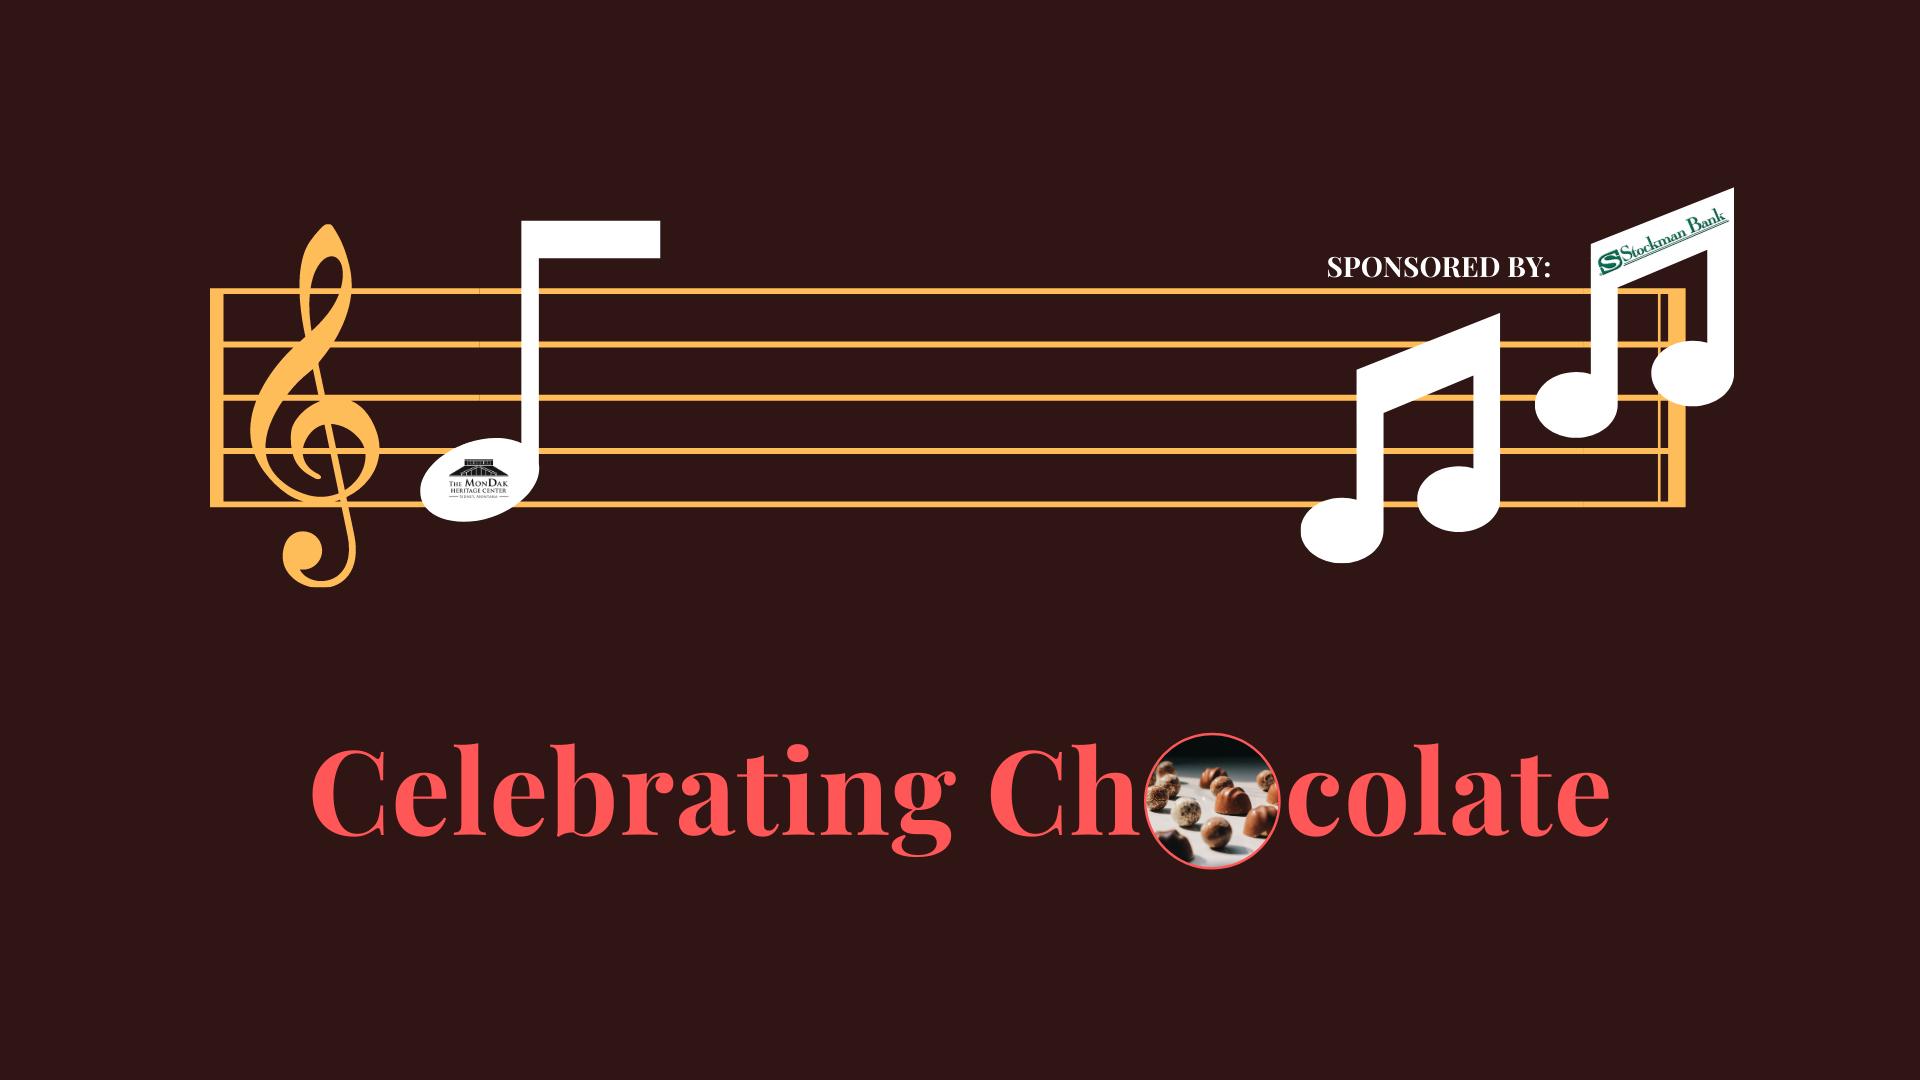 Celebrating Chocolate